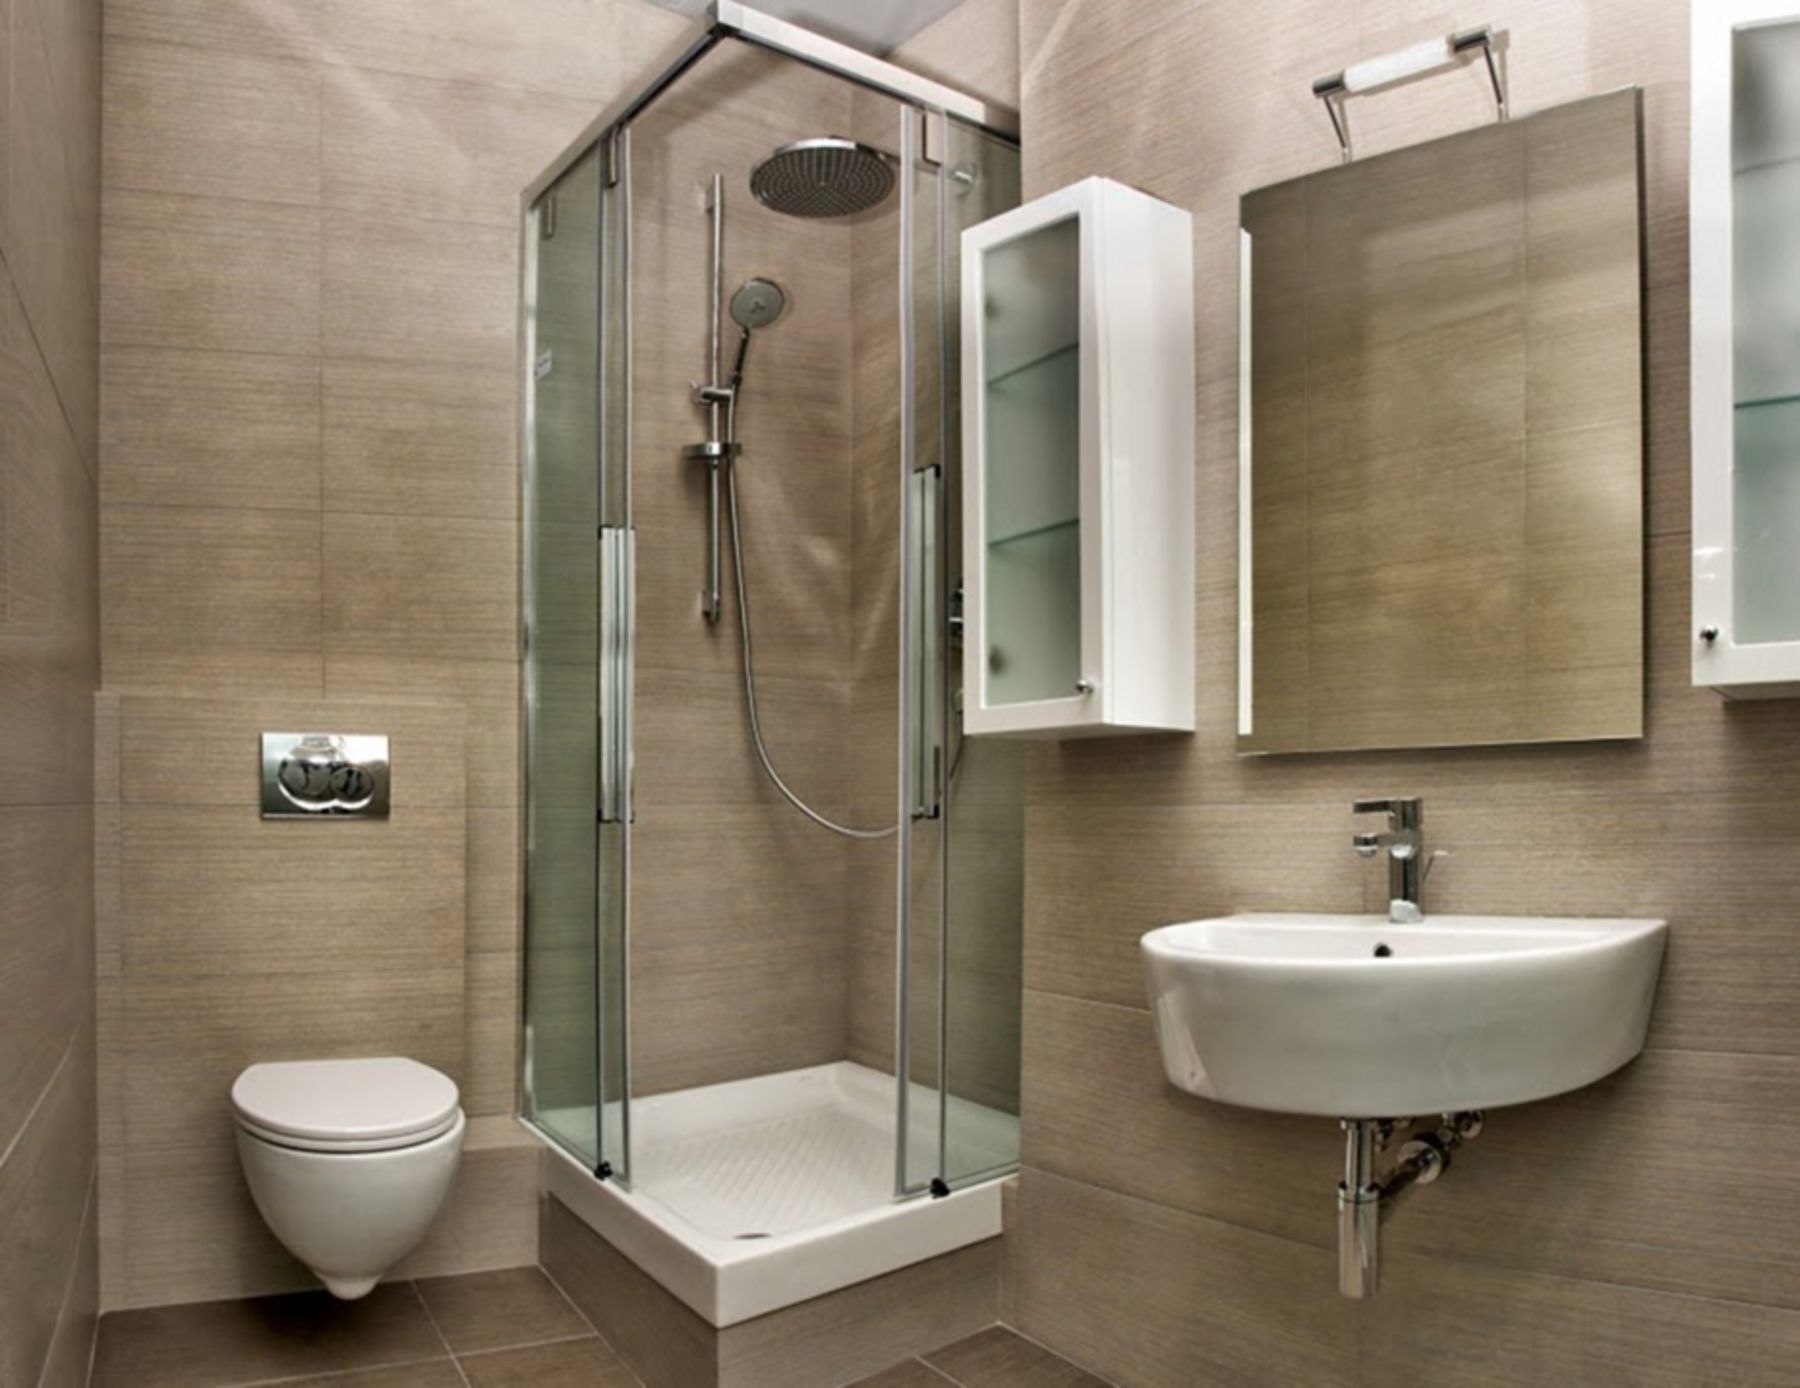 10 Gorgeous Minimalist Bathroom Design Ideas With Shower Simple Bathroom Bathroom Remodel Designs Small Bathroom With Shower